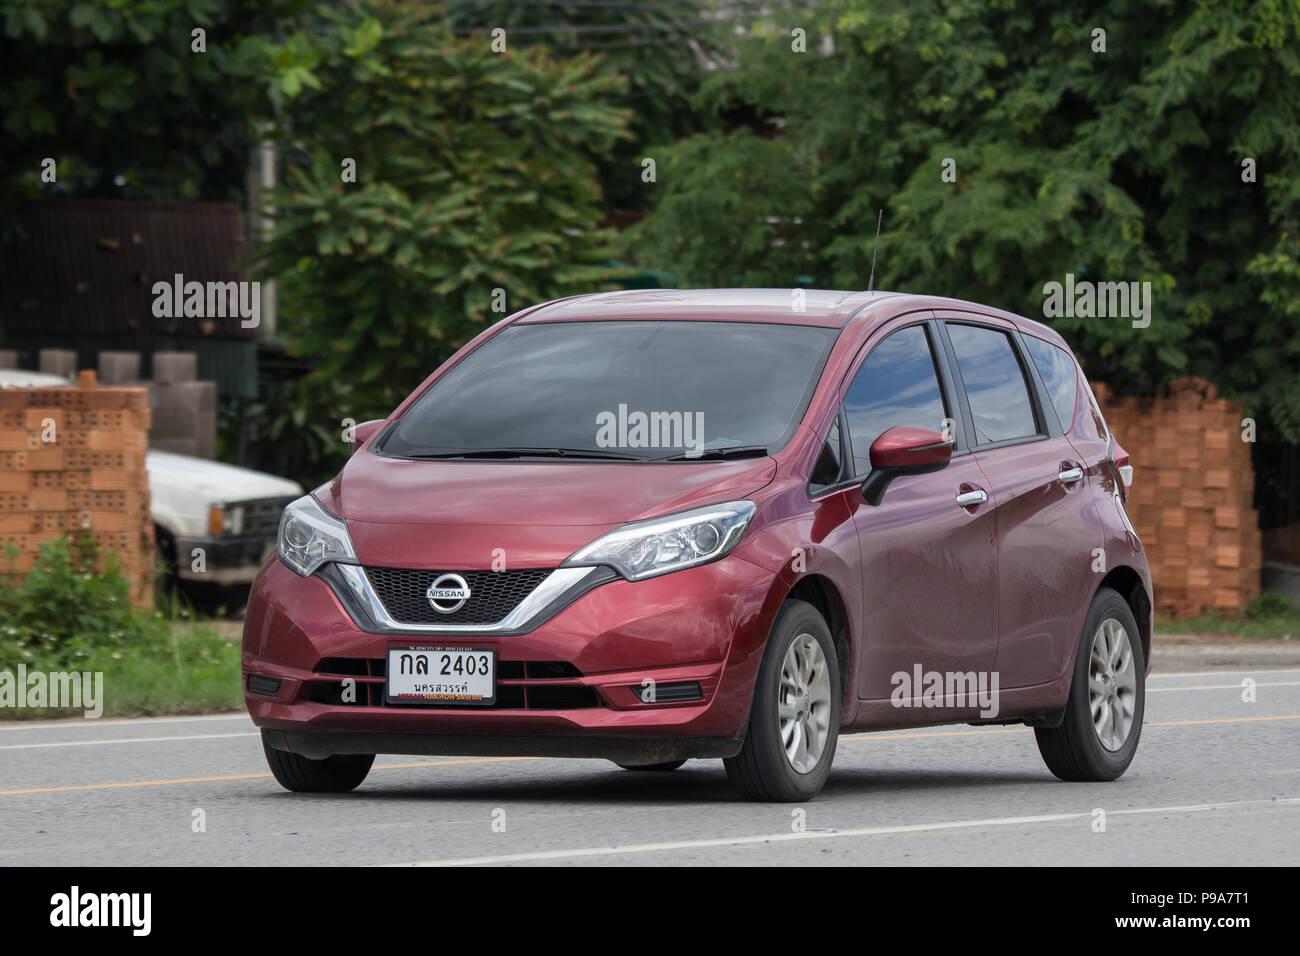 chiangmai, thailand - 28. juni 2018: private neue eco auto nissan